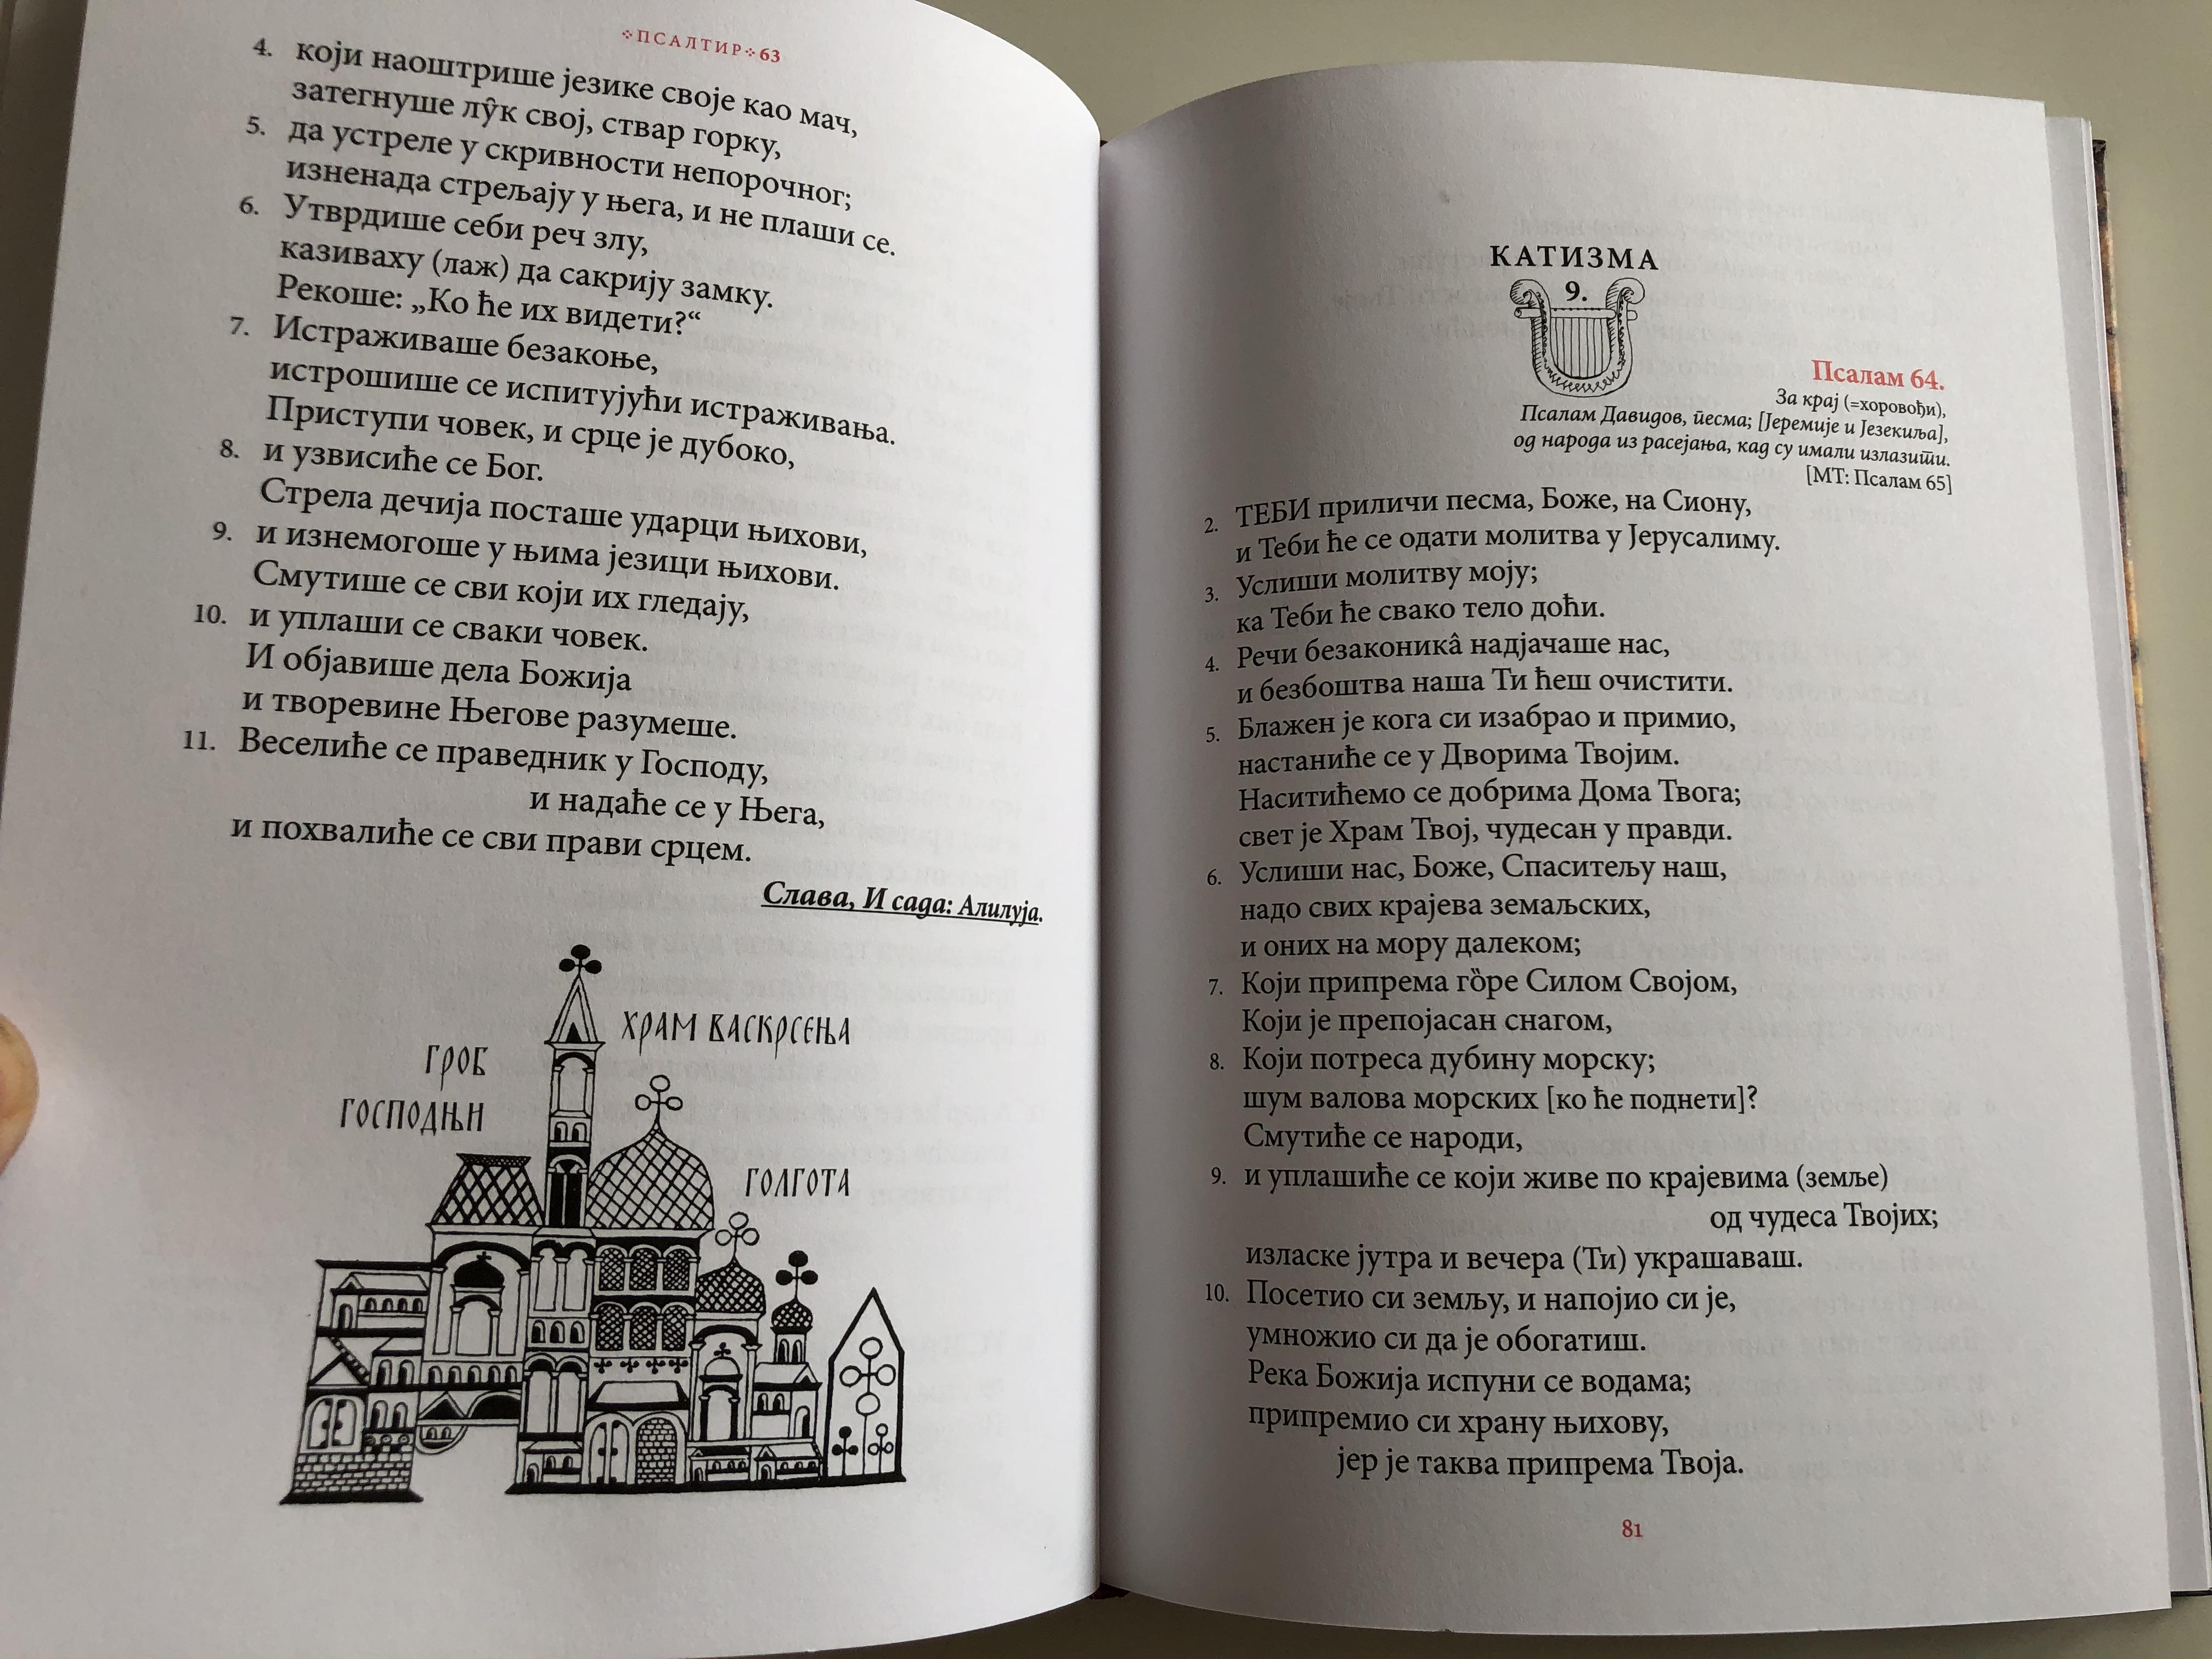 serbian-psalm-book-with-9-biblical-songs-8-.jpg